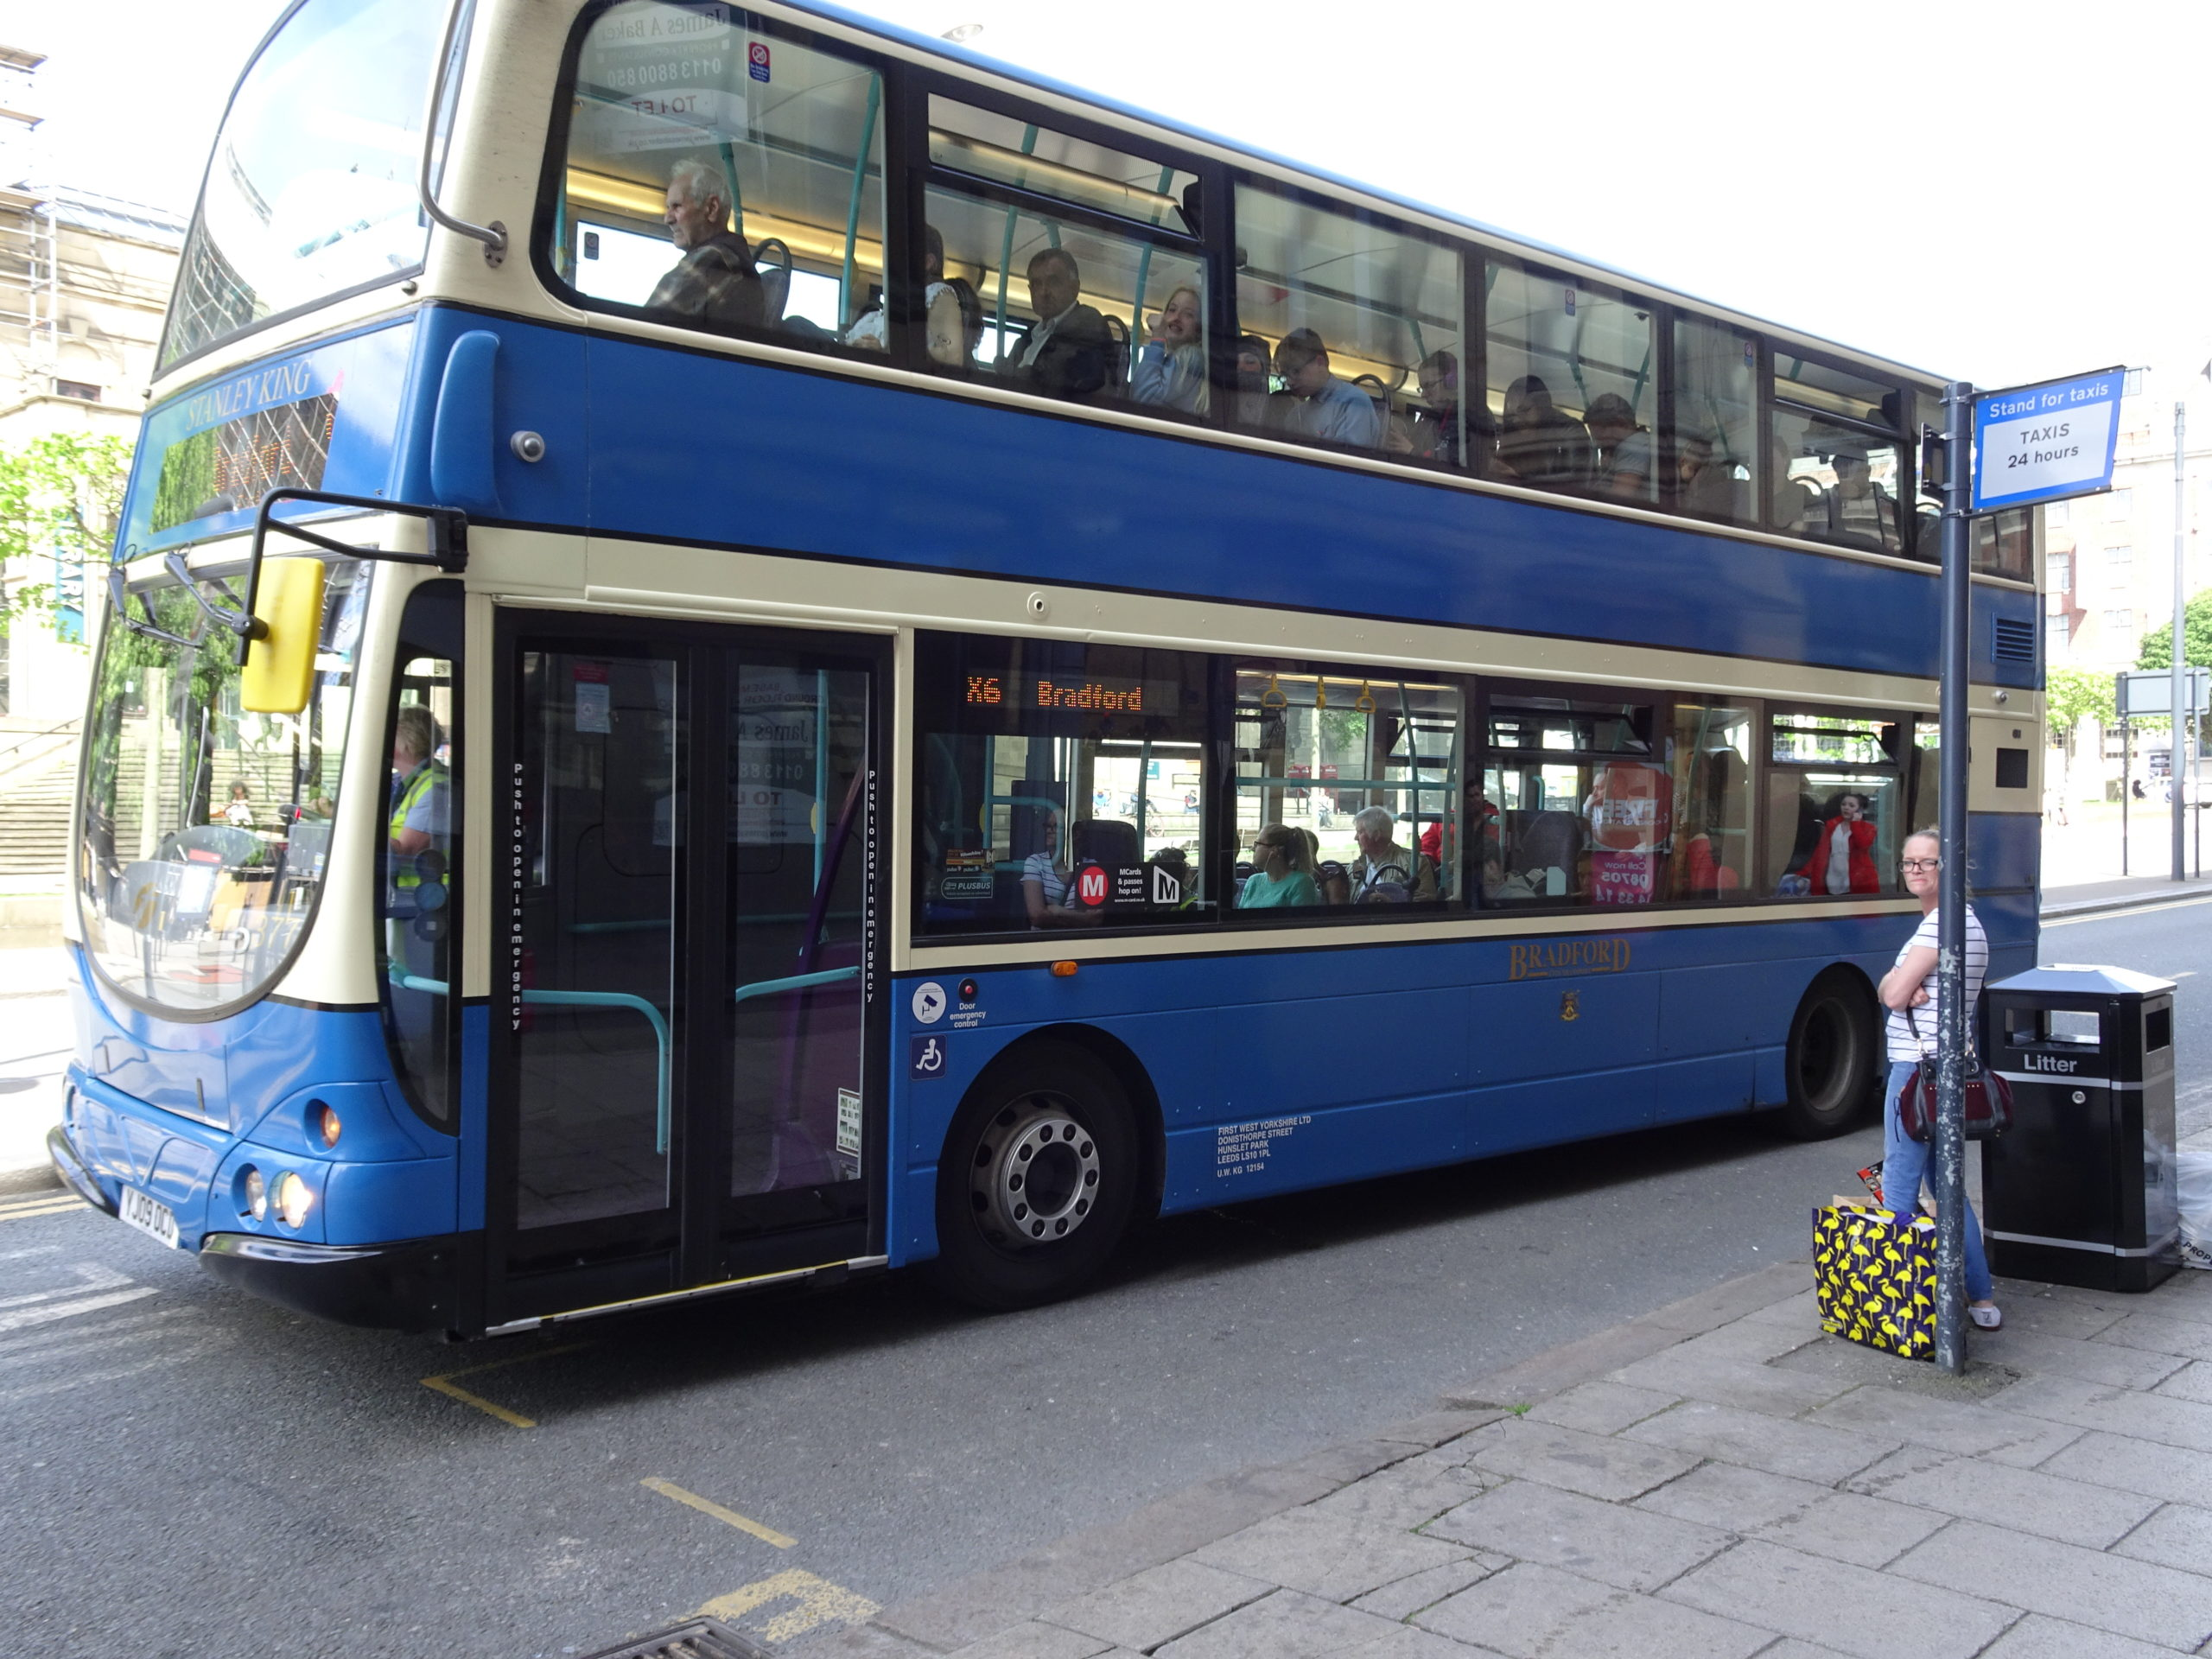 bradford bus